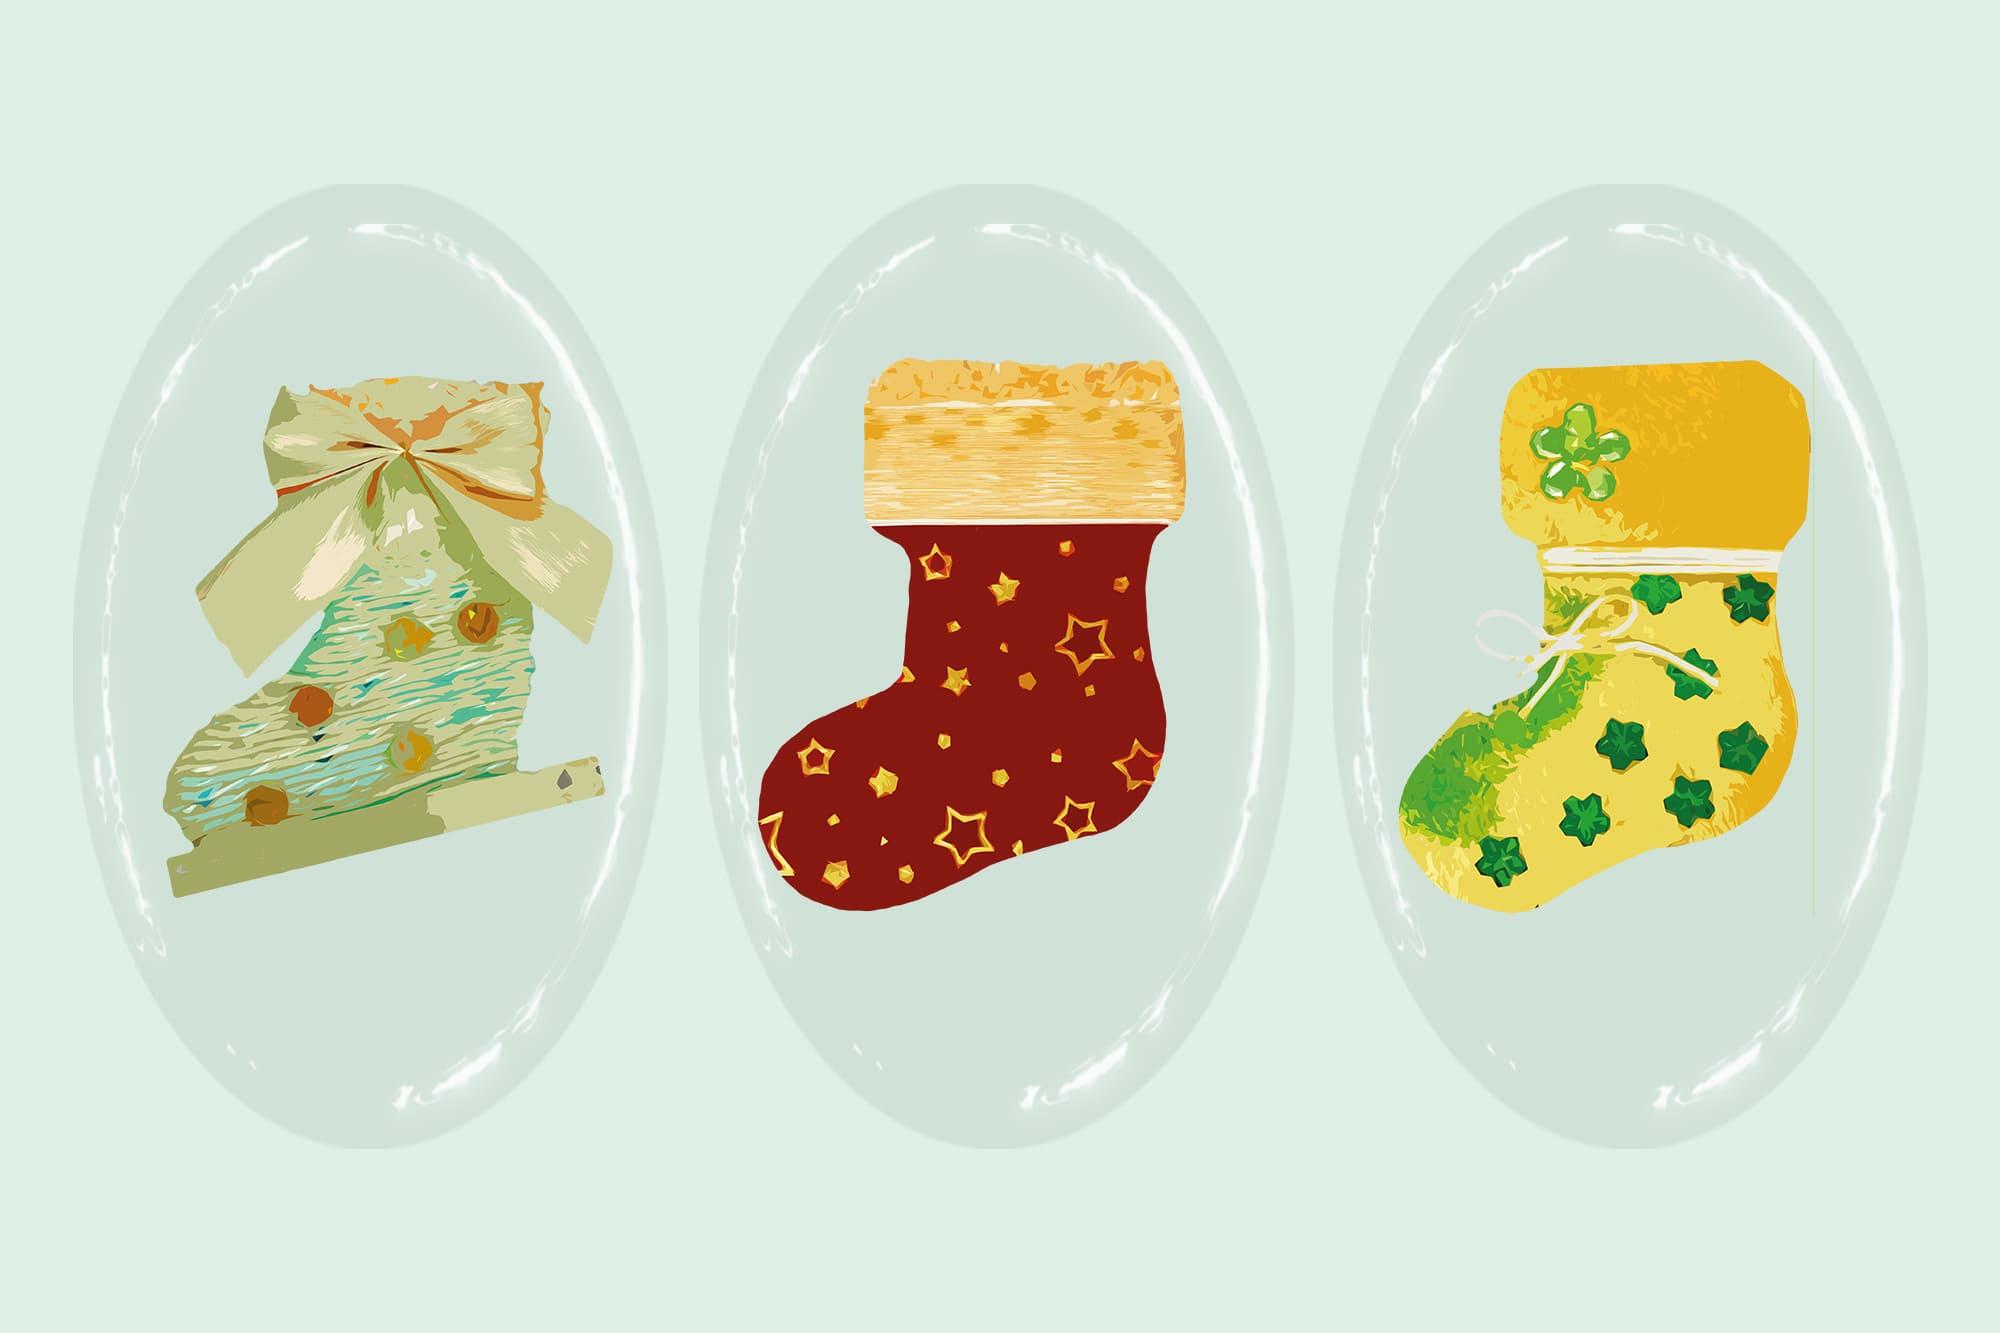 496 Christmas Illustrations: Christmas Vectors Bundle SVG, EPS, AI - Boots c